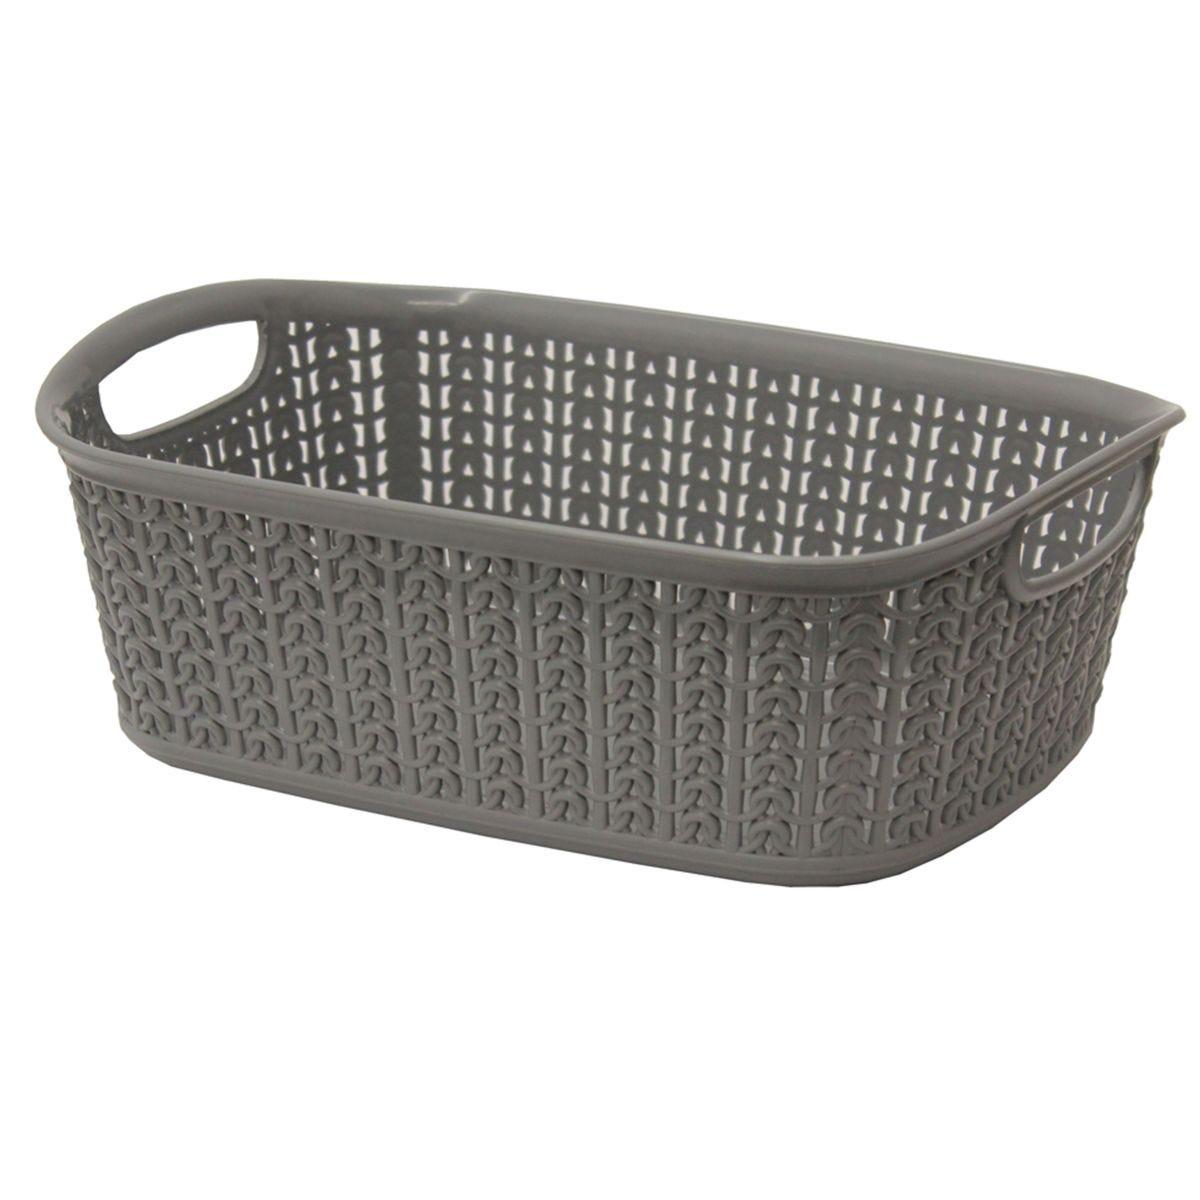 JVL Knit Design Loop Plastic Rectangular Small Storage Basket with Handles Ivory 20 x 26 x 9.5 cm 3 Litres